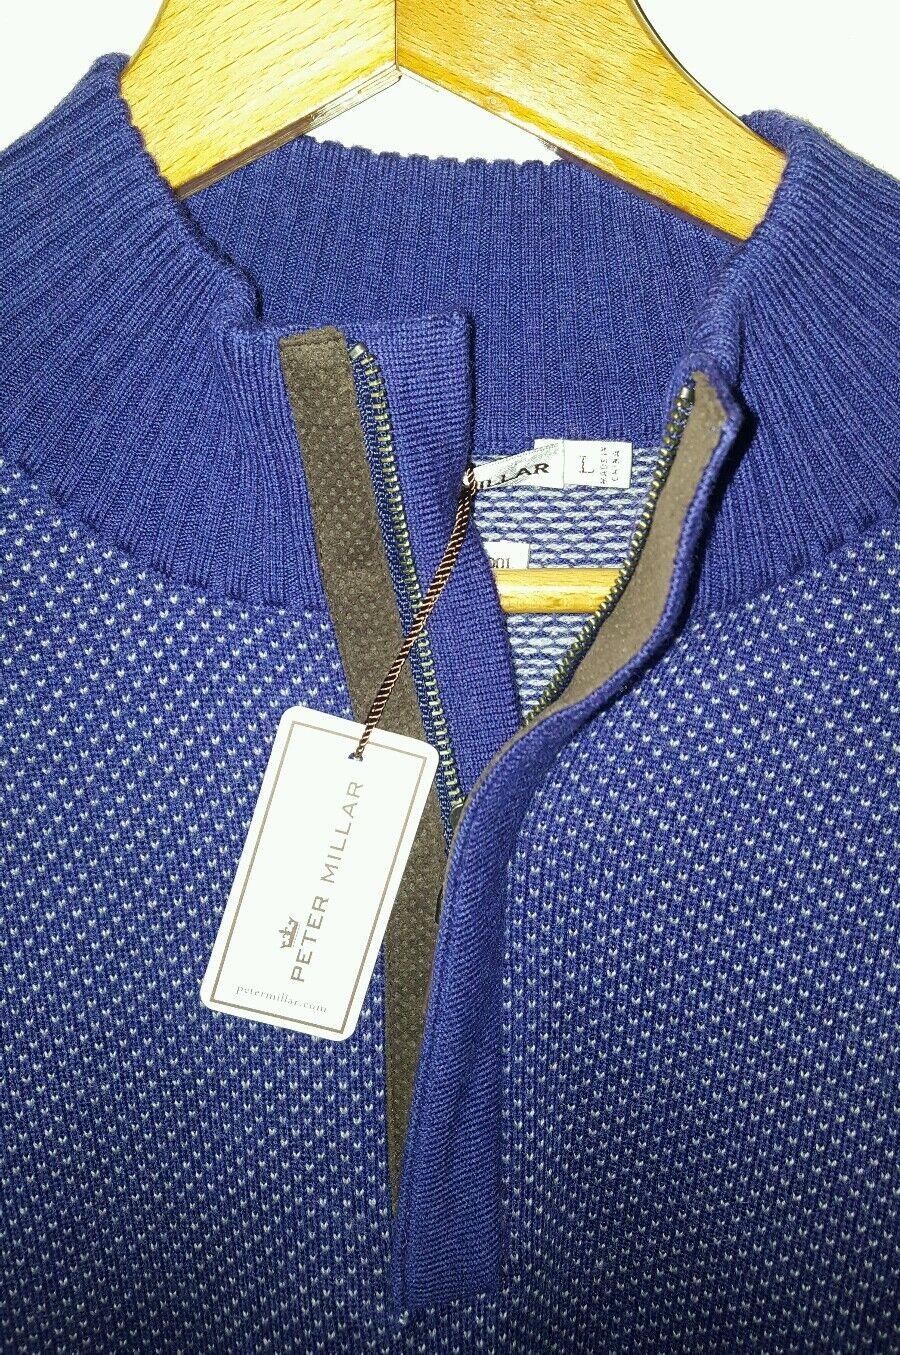 Peter Millar Quarter Zip Merino Lana Sweater & Trim Suede Trim & Uomo Sz Large NWT  245 1284f6